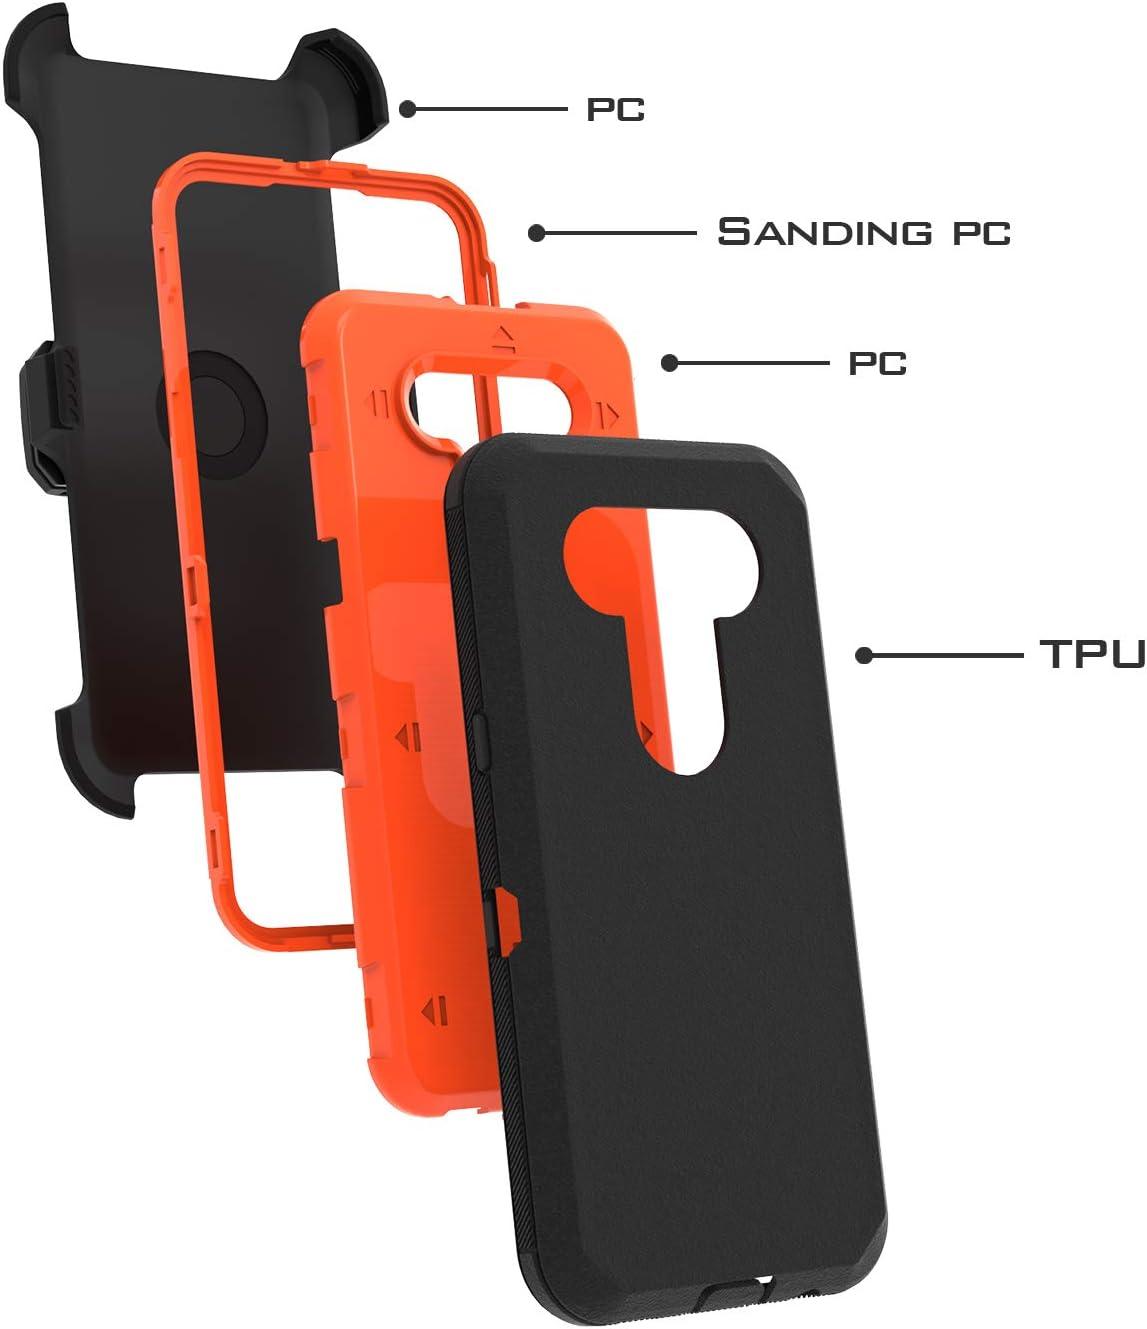 UNC Pro 3 in 1 Belt Clip Holster Cell Phone Case for LG K51/LG Q51/LG Reflect, Heavy Duty Hybrid Shockproof Bumper Case with Kickstand, Black/Orange